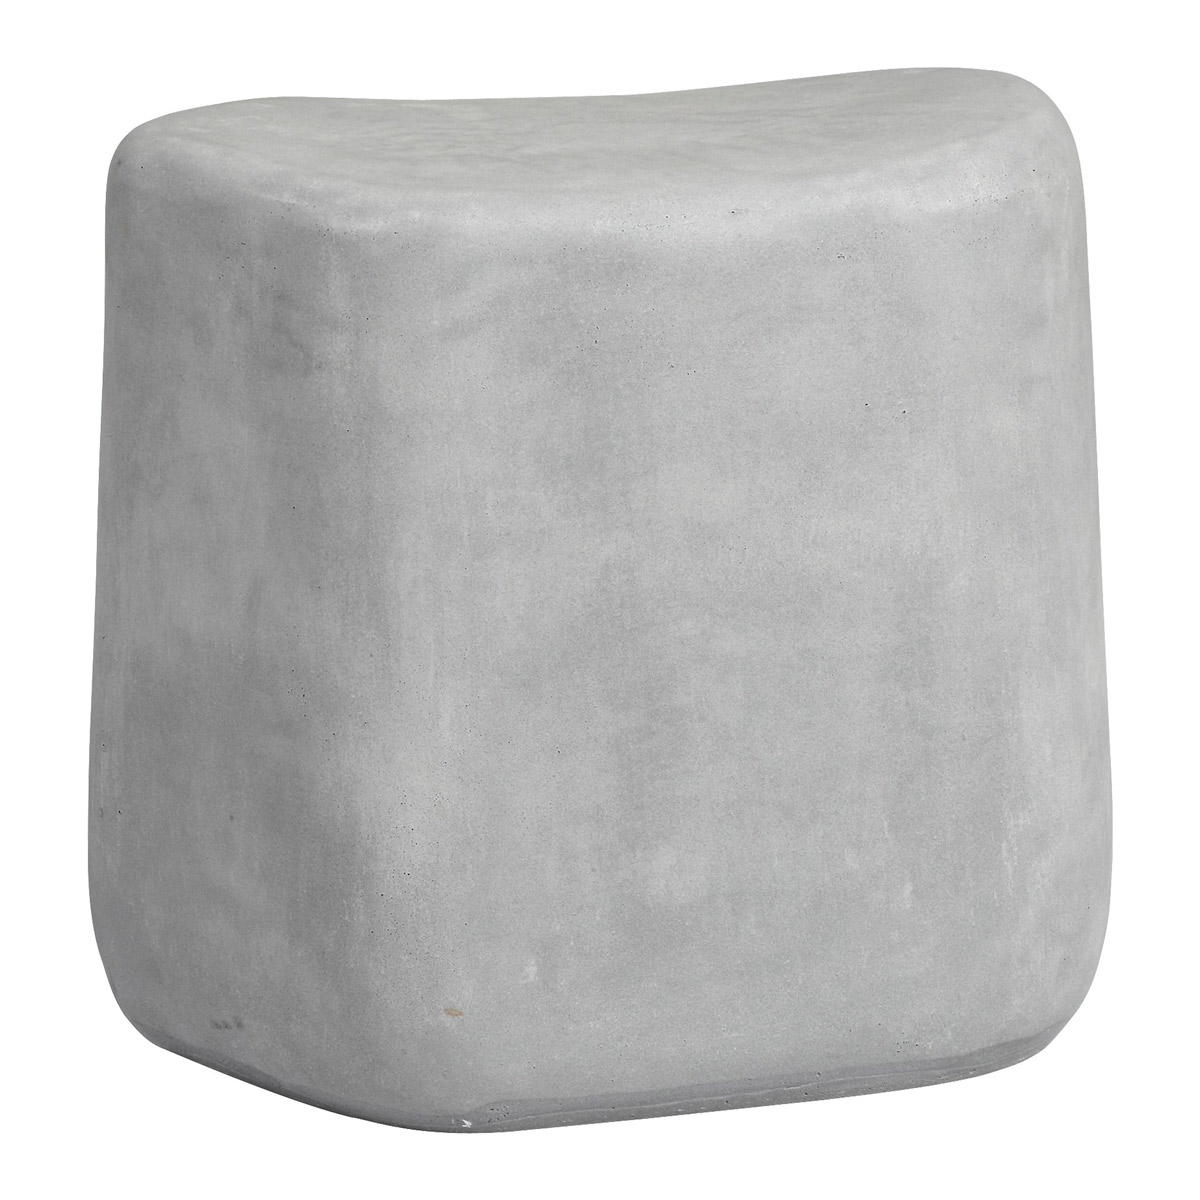 giant boulder patio tables stools landscape accents: patio stool